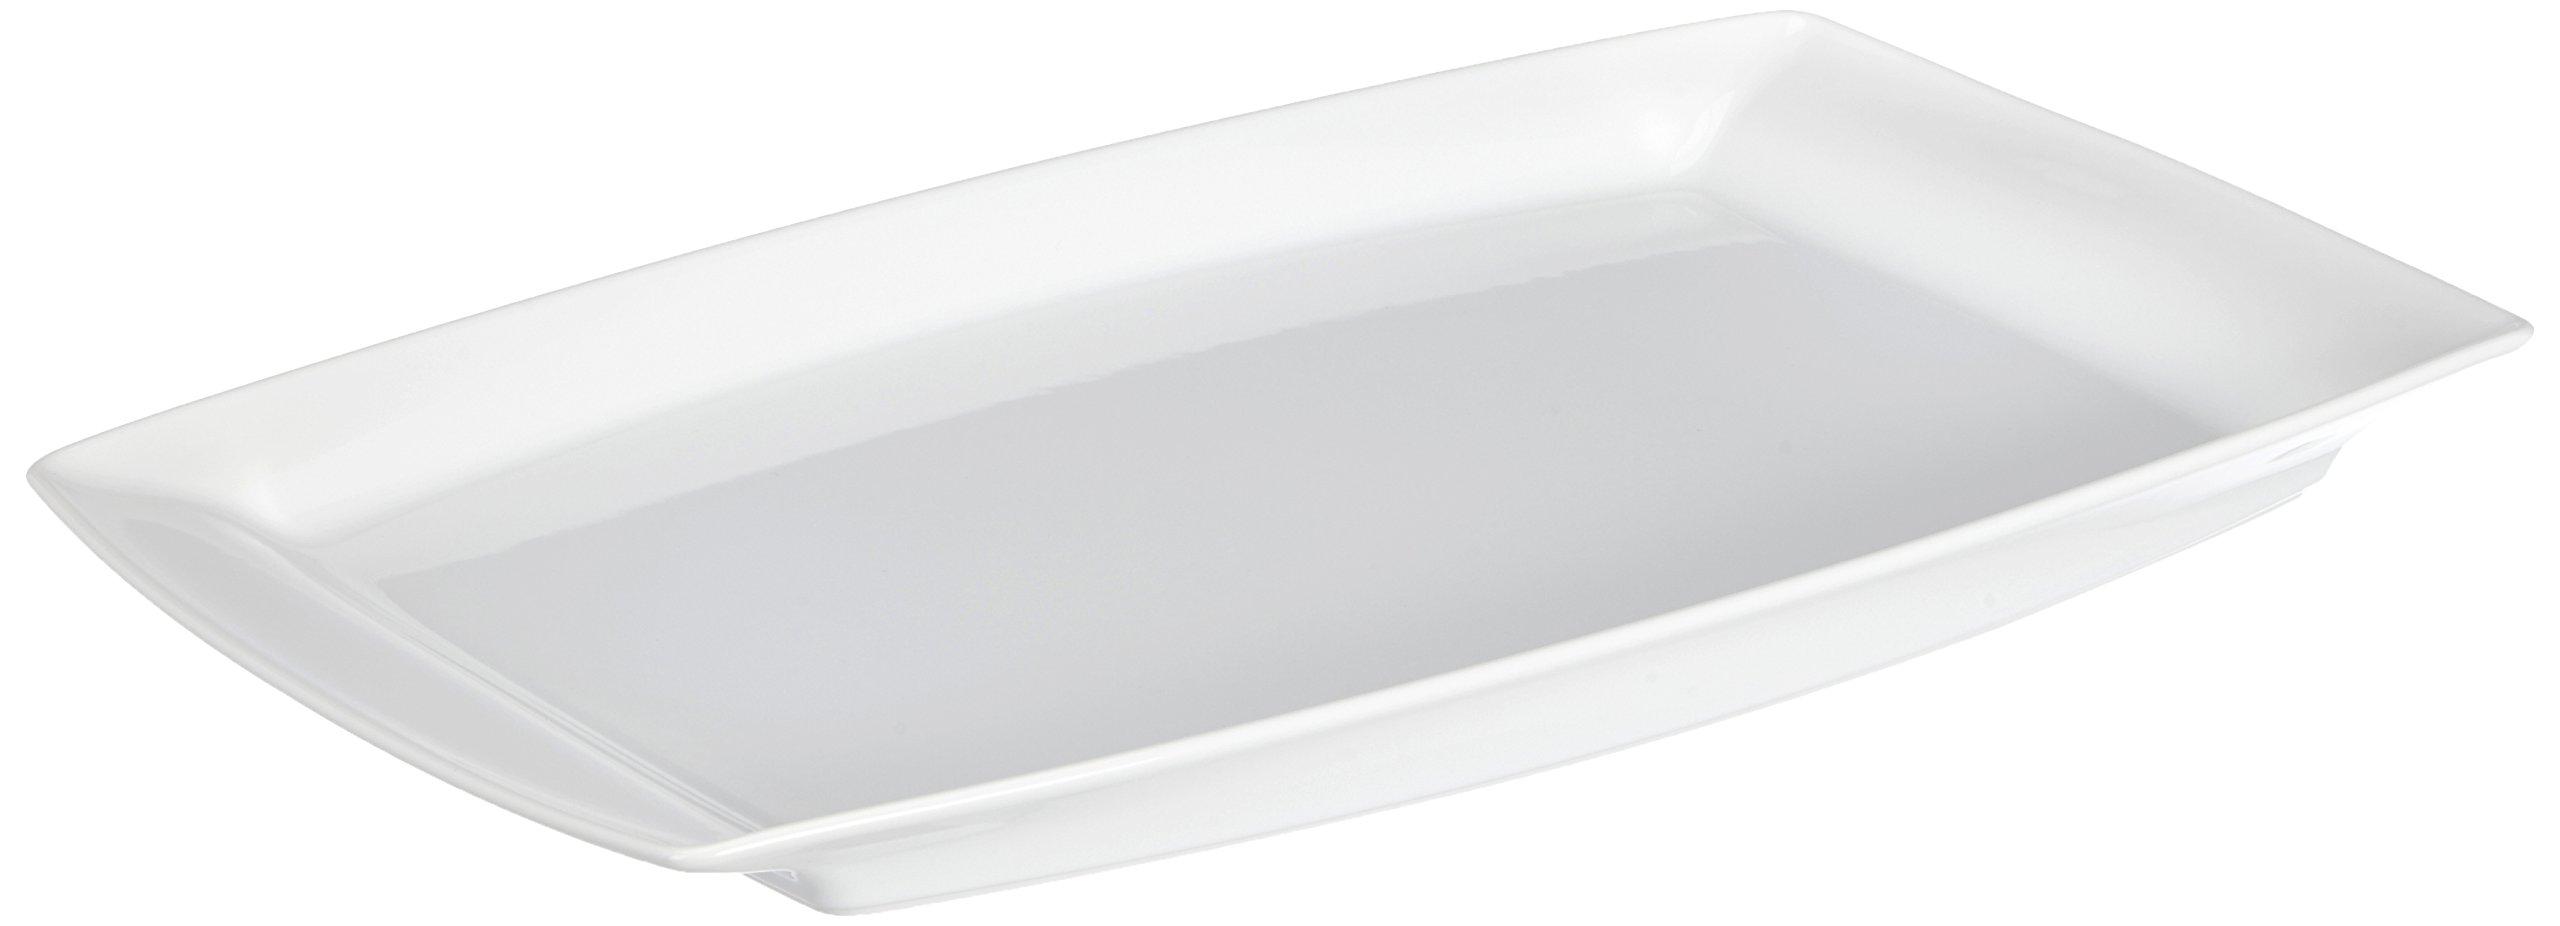 REVOL 004345 AL04325 Buffet Serving Dish, 20.75'' x 12.75'' x 1.5'', White by Revol (Image #1)